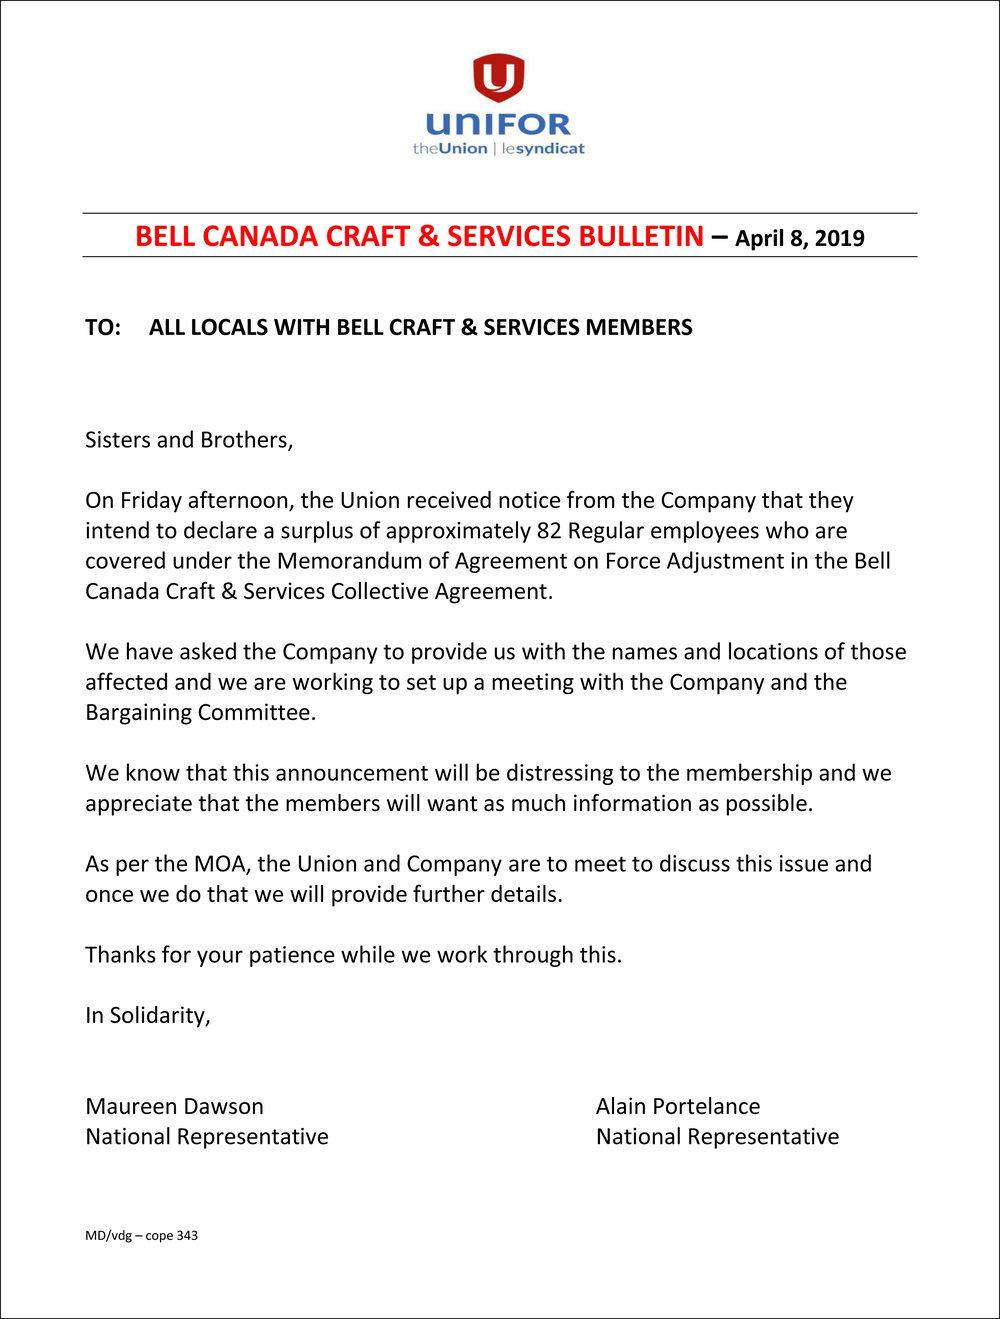 Bell Canada Craft Services Bulletin -  April 2019.jpg